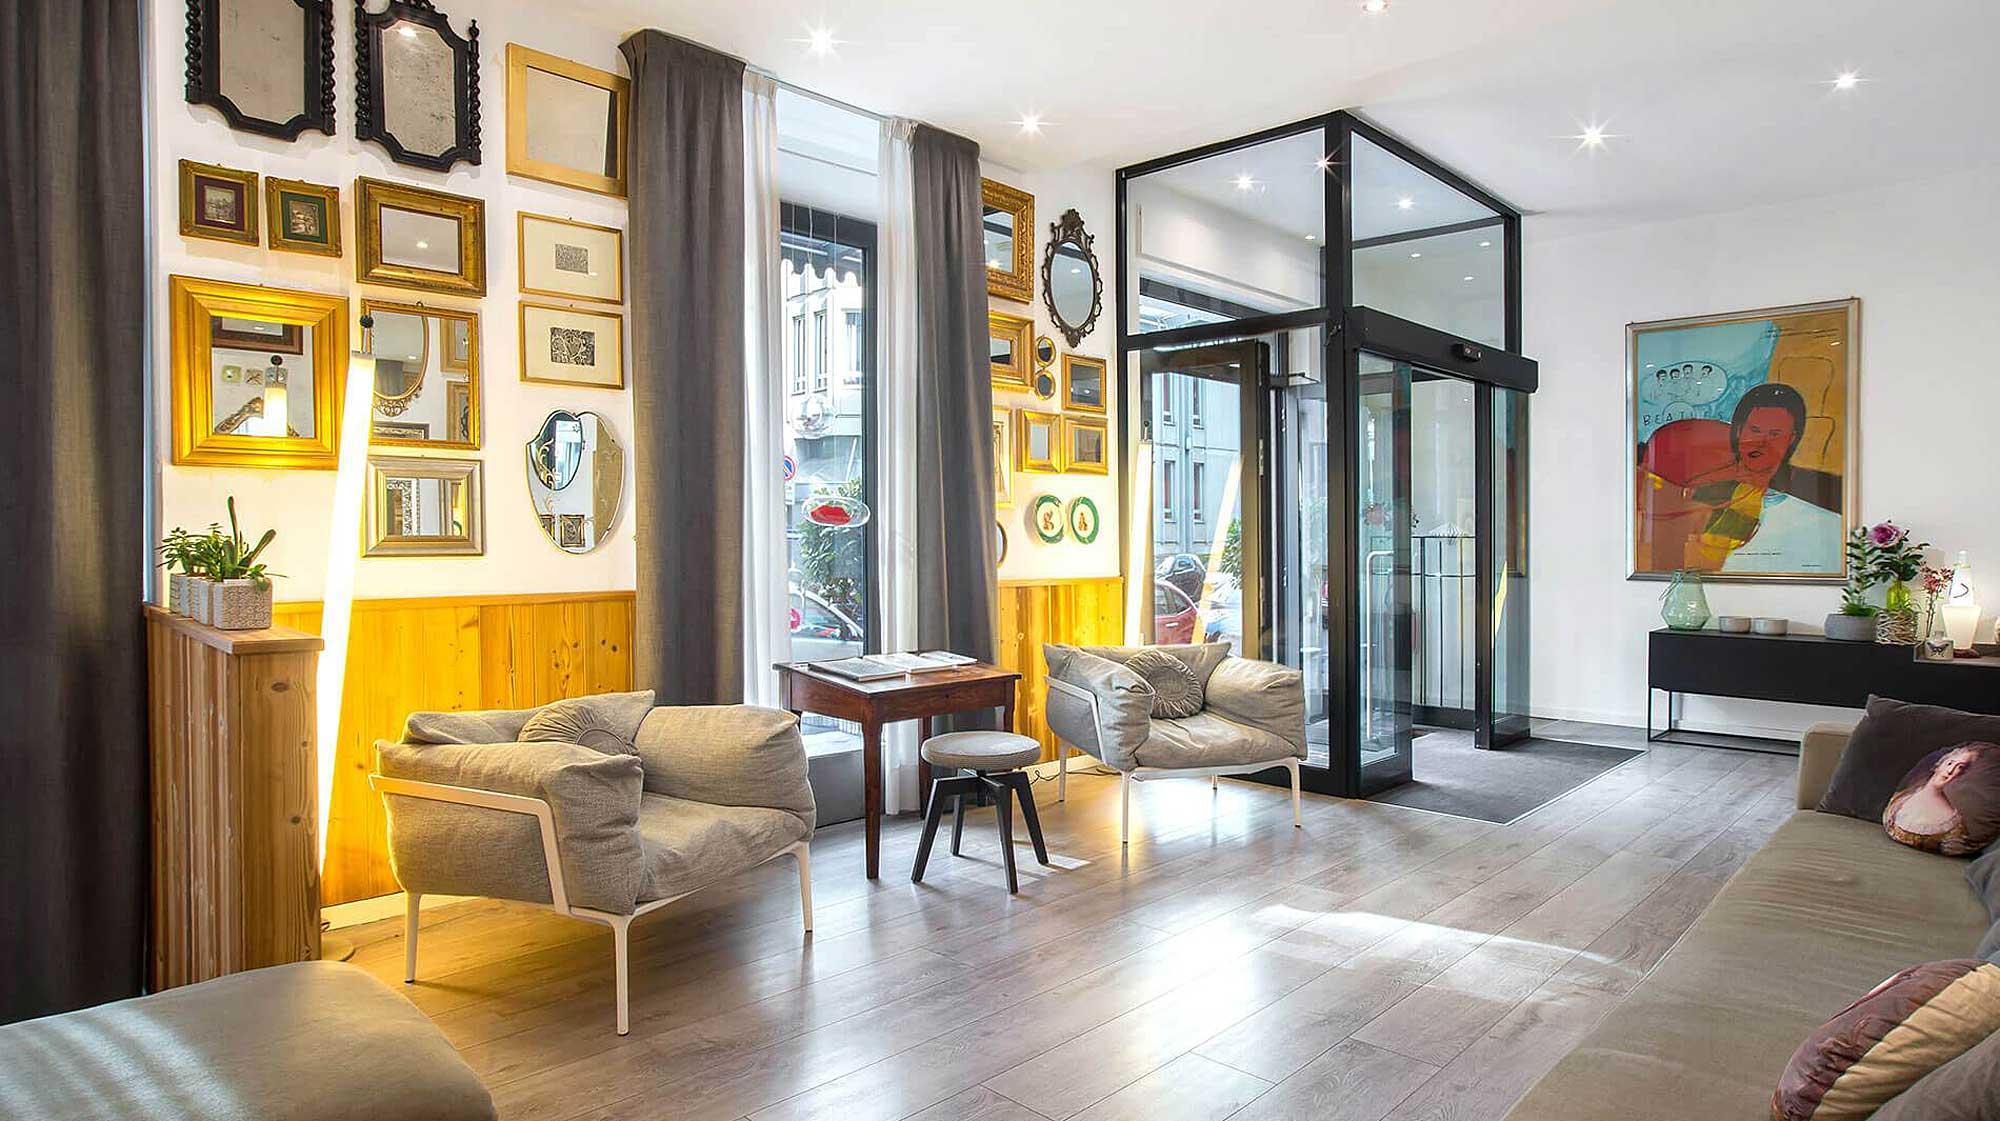 Hotel Bernina, 3 étoiles près de la gare de Milan Italie